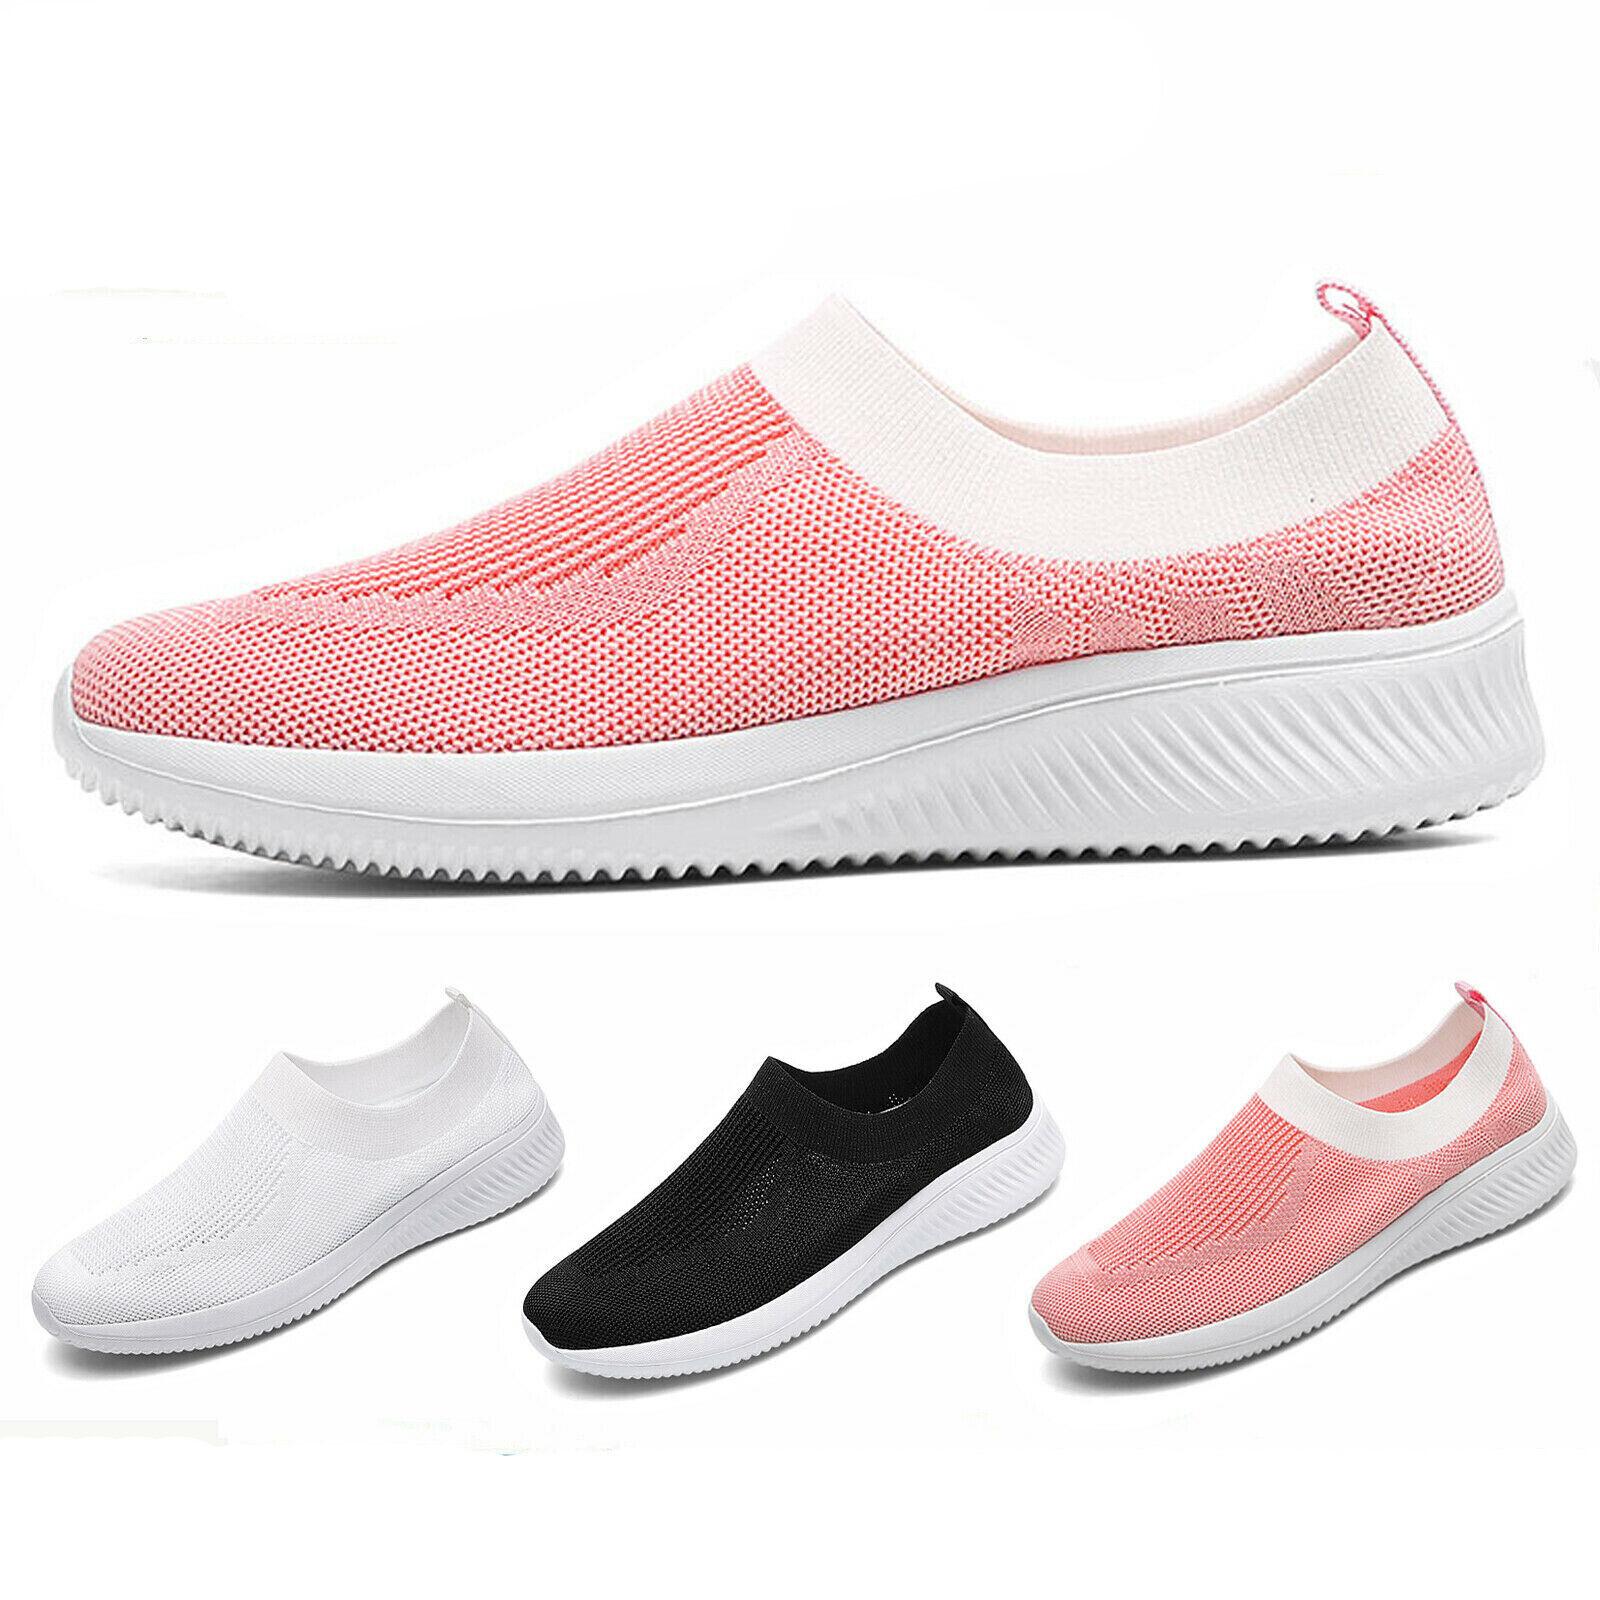 Women's Casual Walking Shoes Sport Slip-On Running Tennis Sn